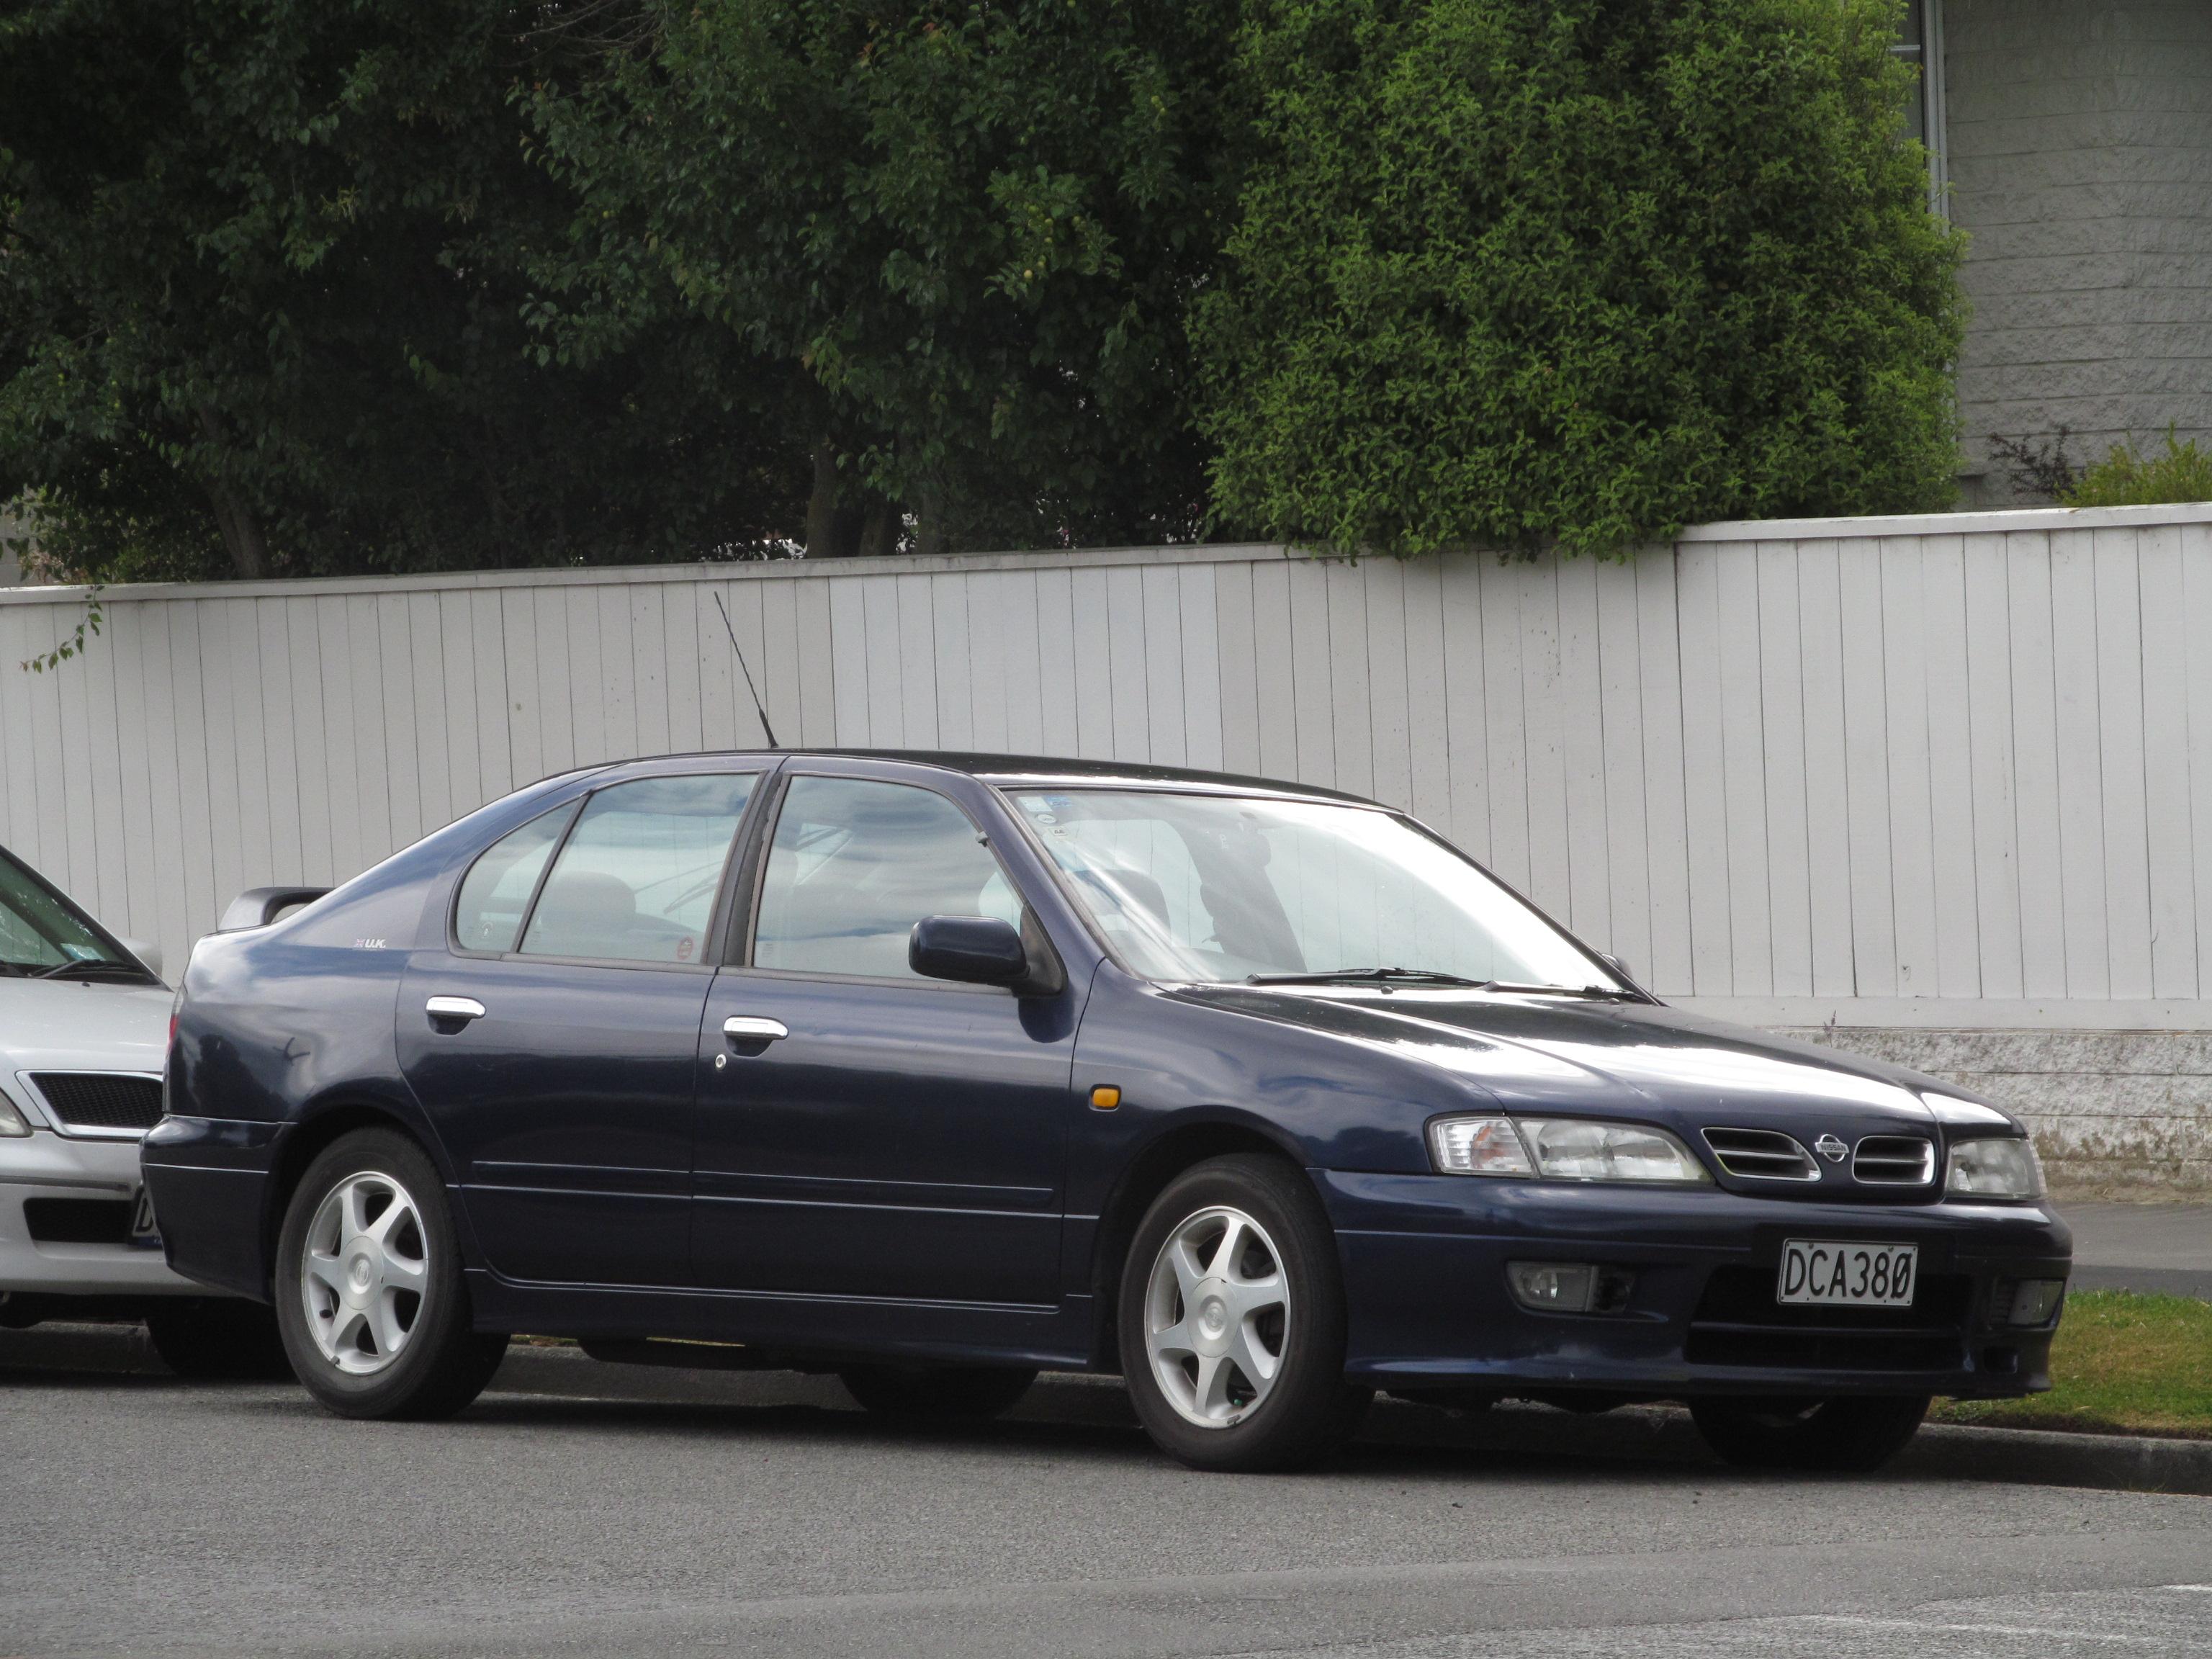 File:Nissan Primera UK GT (Japan, assembled in UK).jpg - Wikipedia